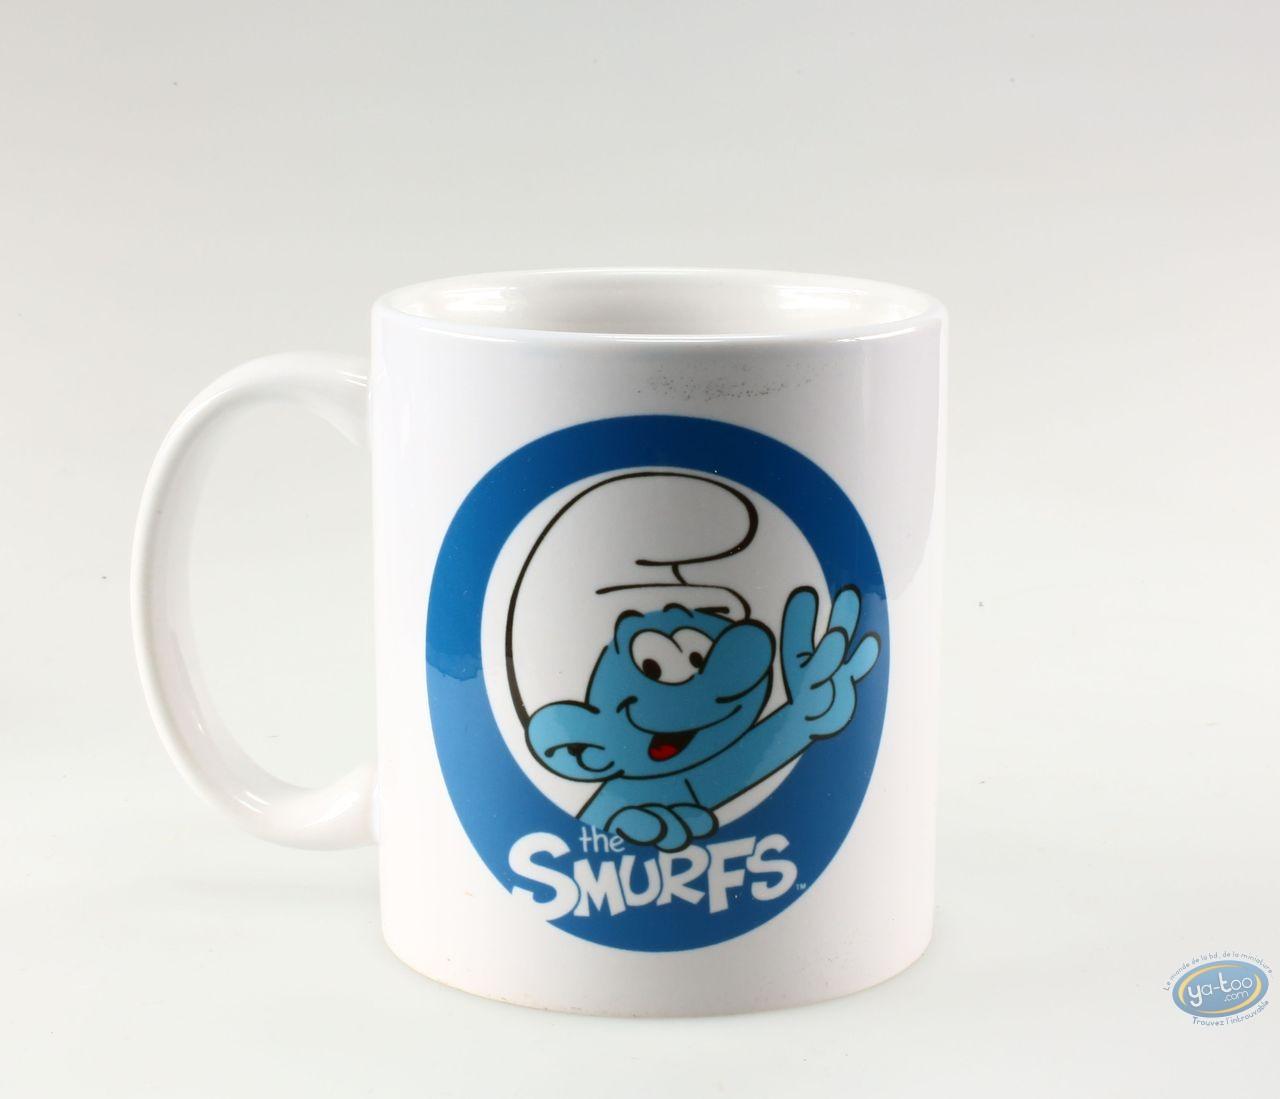 Art de la Table, Schtroumpfs (Les) : Mug Schtroumpf logo